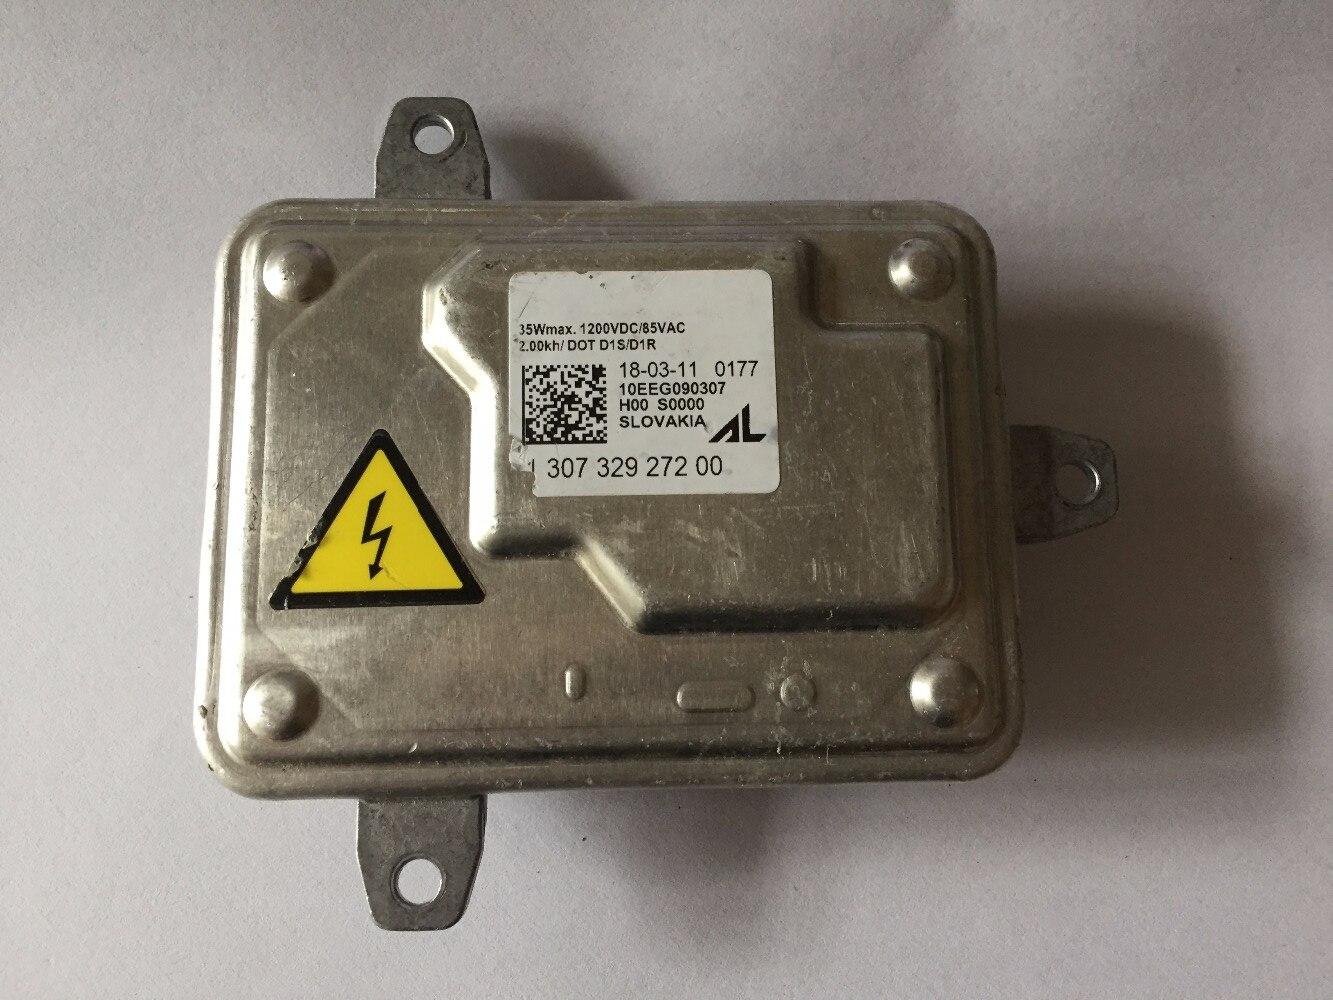 Used original gen6 headlight ballast D1S D1R 130732927200 1 307 329 272 00